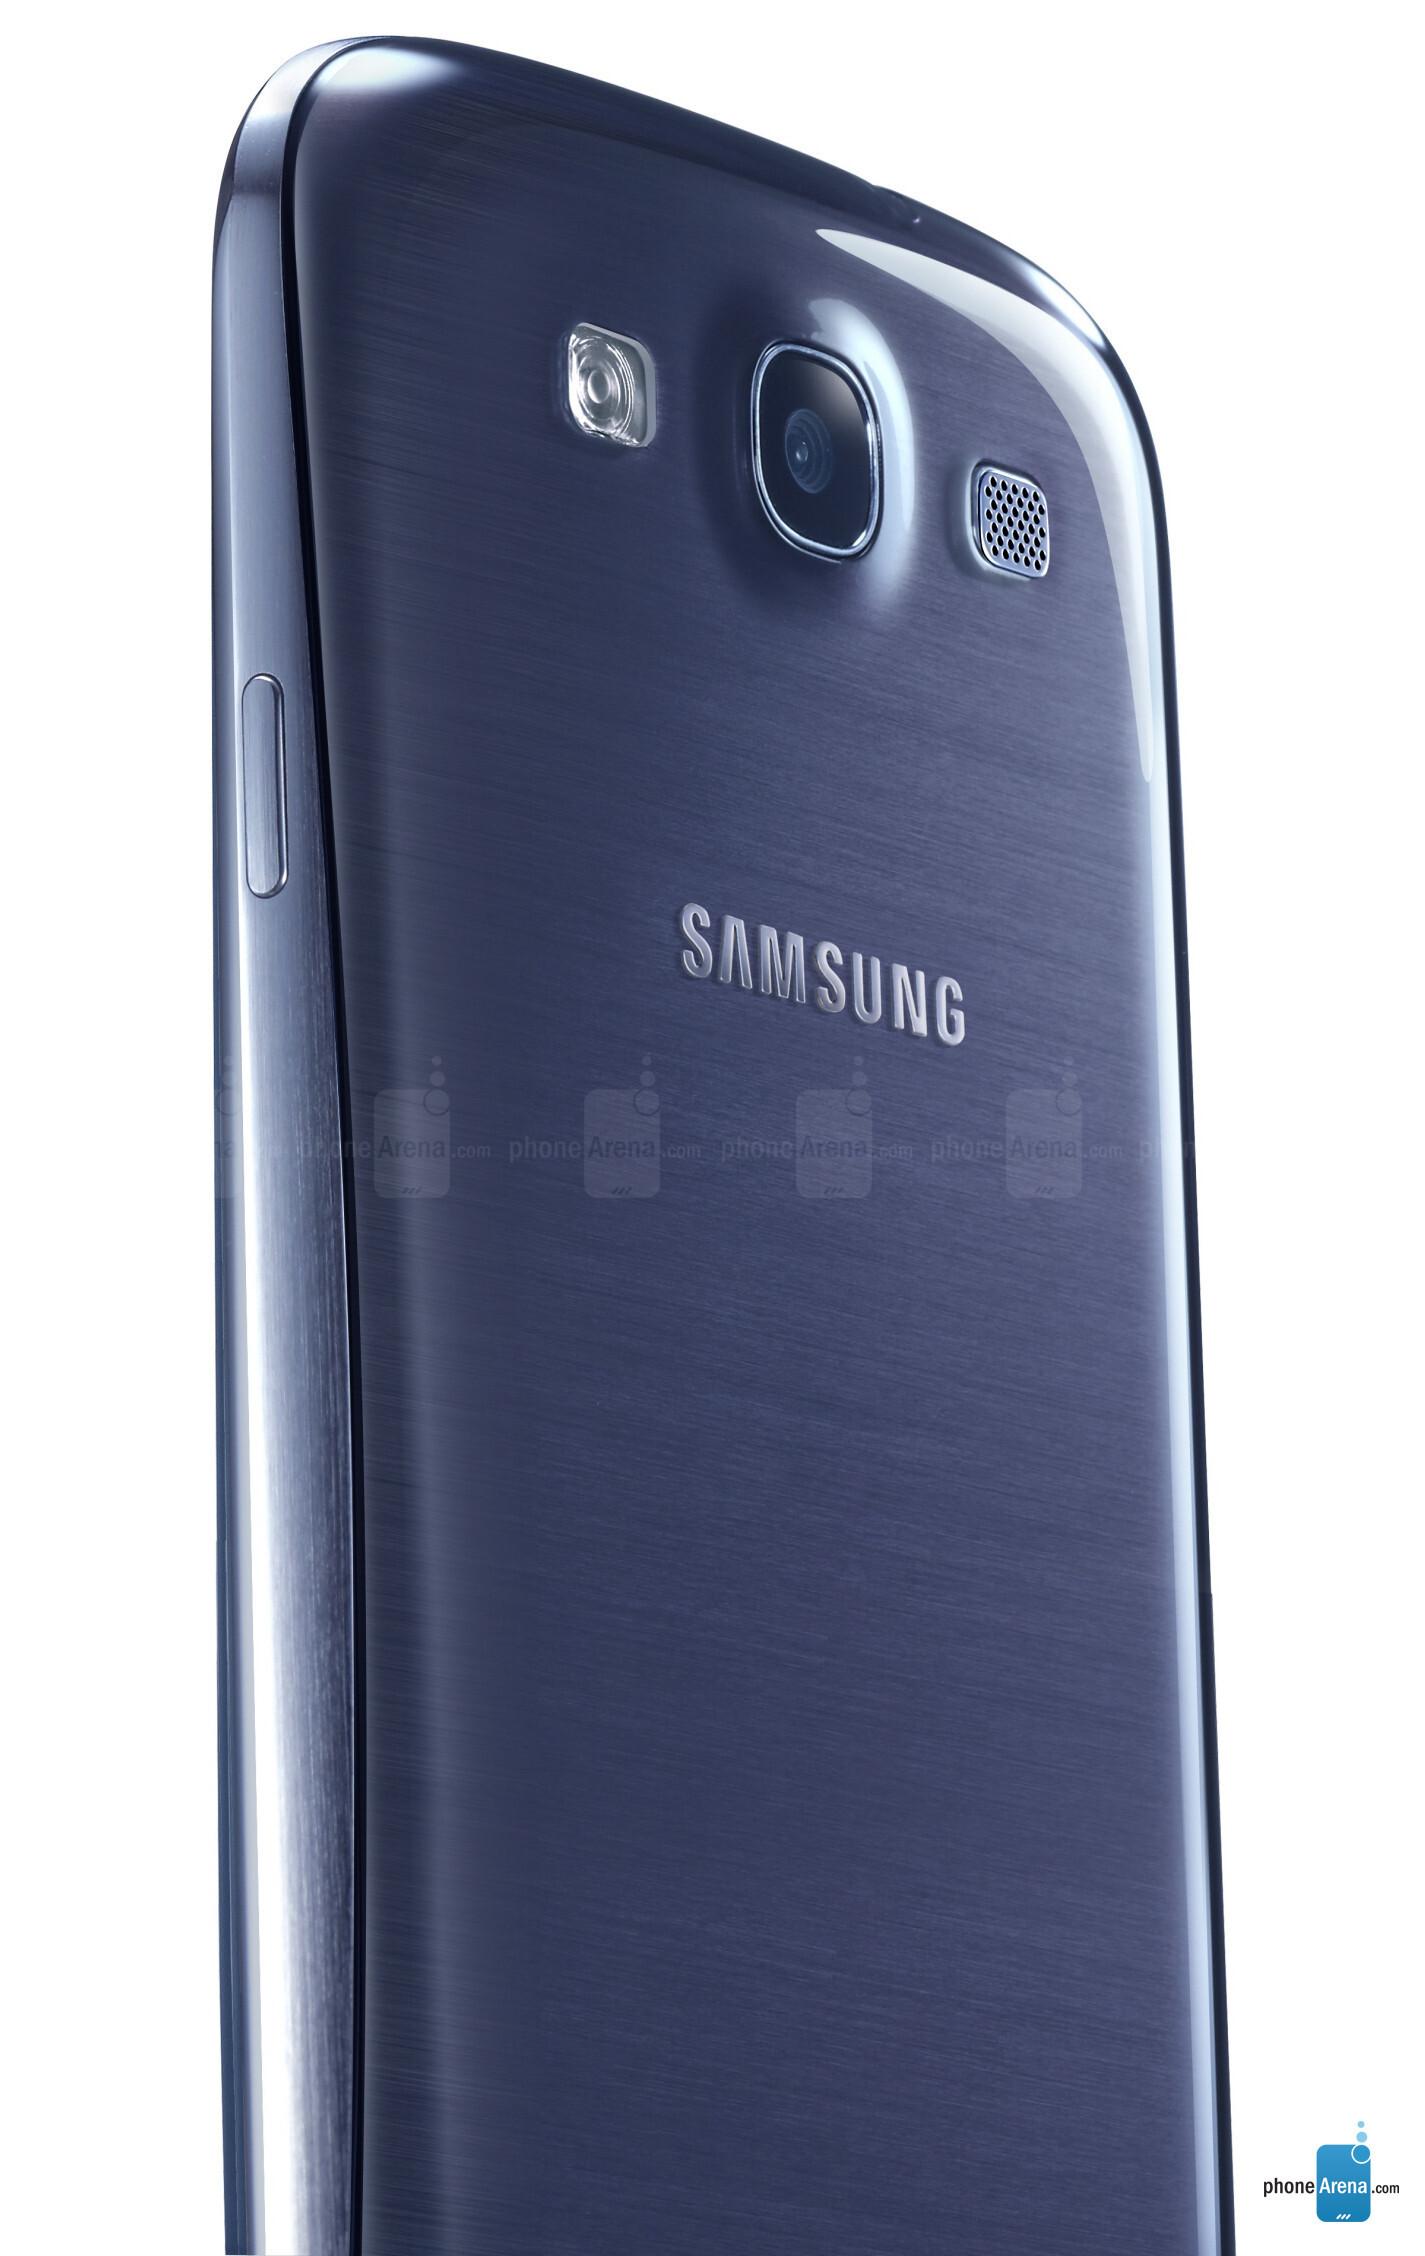 samsung galaxy s3 blue. samsung galaxy s3 blue